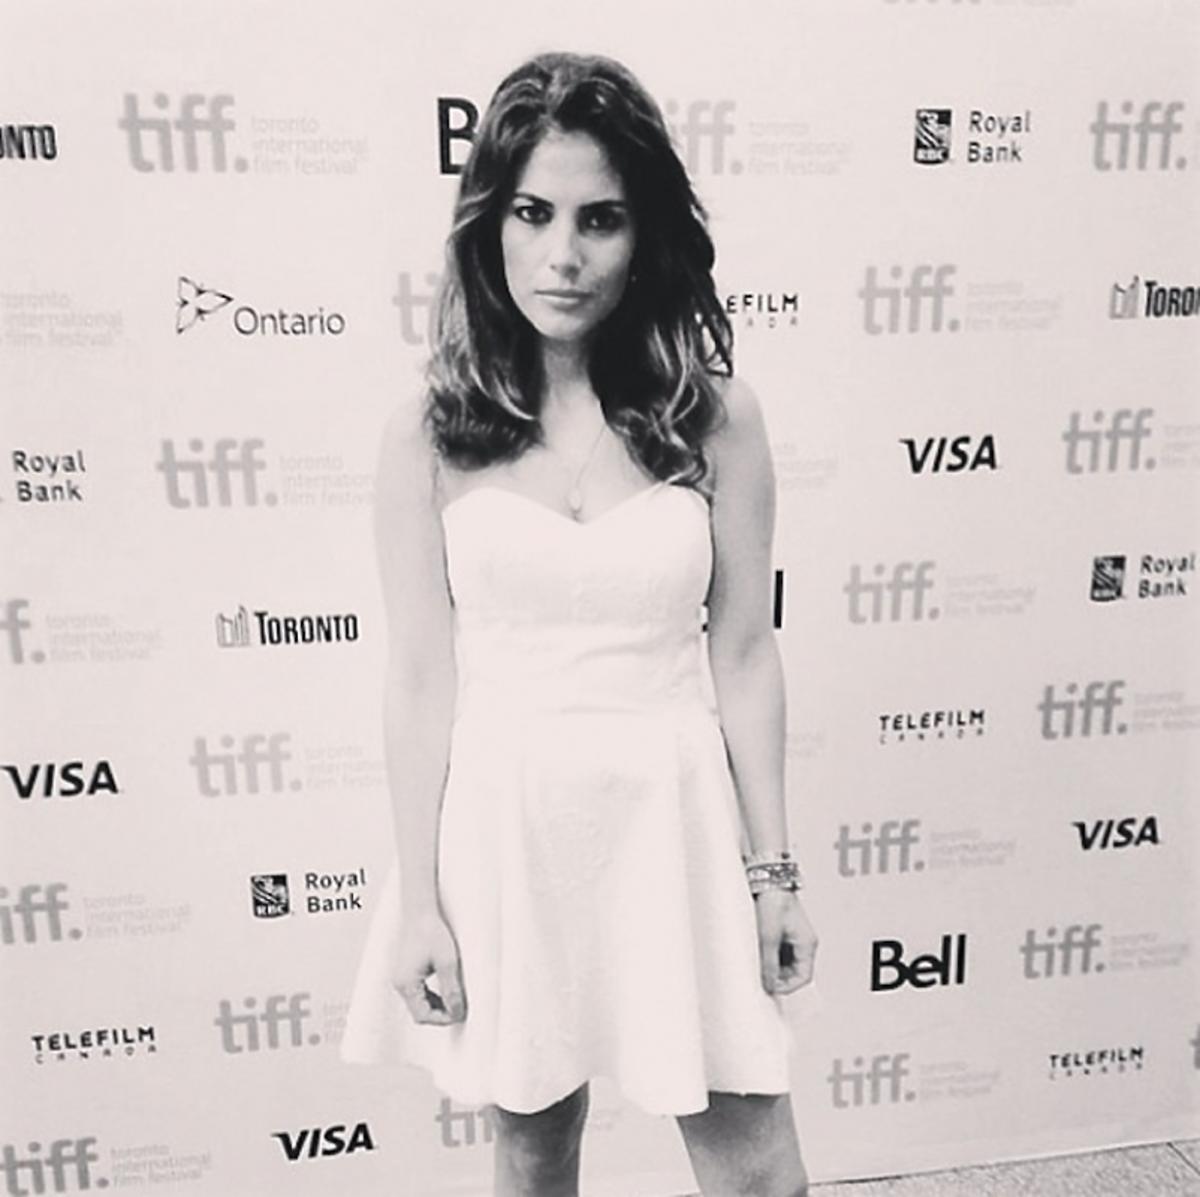 Weronika Rosati na festiwalu TIFF w Kanadzie